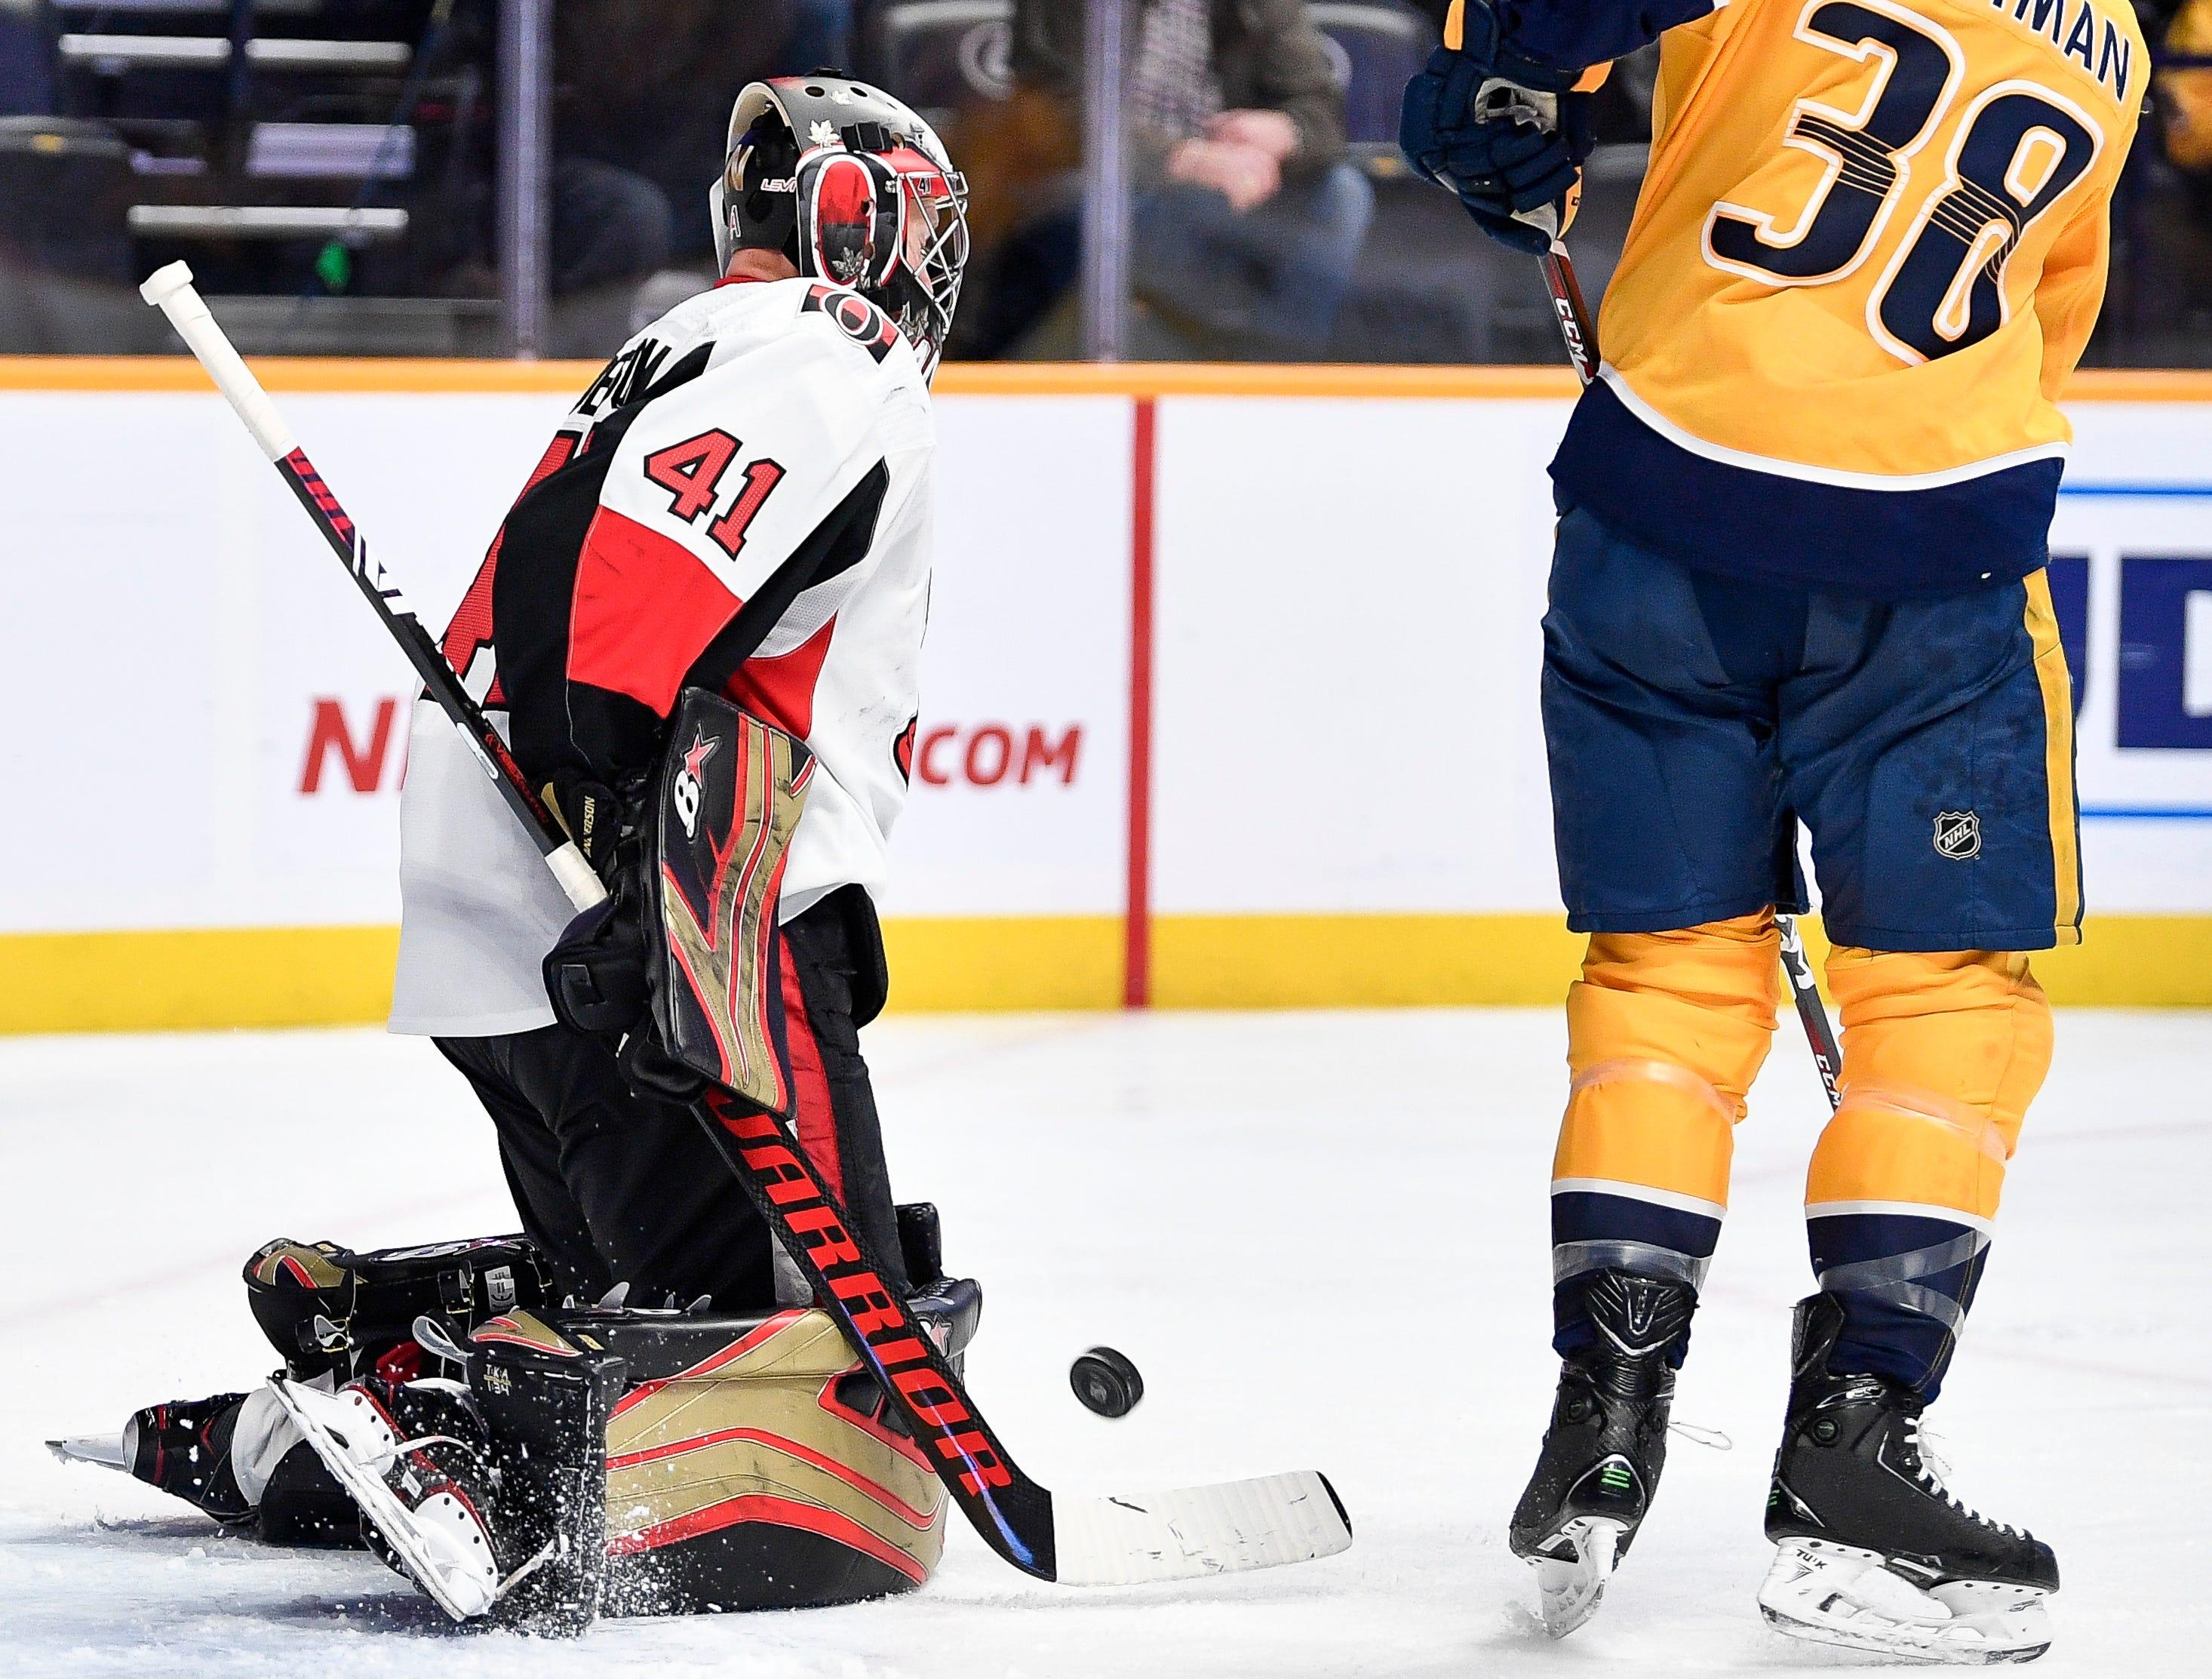 Ottawa Senators goaltender Craig Anderson (41) battles against Nashville Predators right wing Ryan Hartman (38) during the third period at Bridgestone Arena in Nashville, Tenn., Tuesday, Dec. 11, 2018.